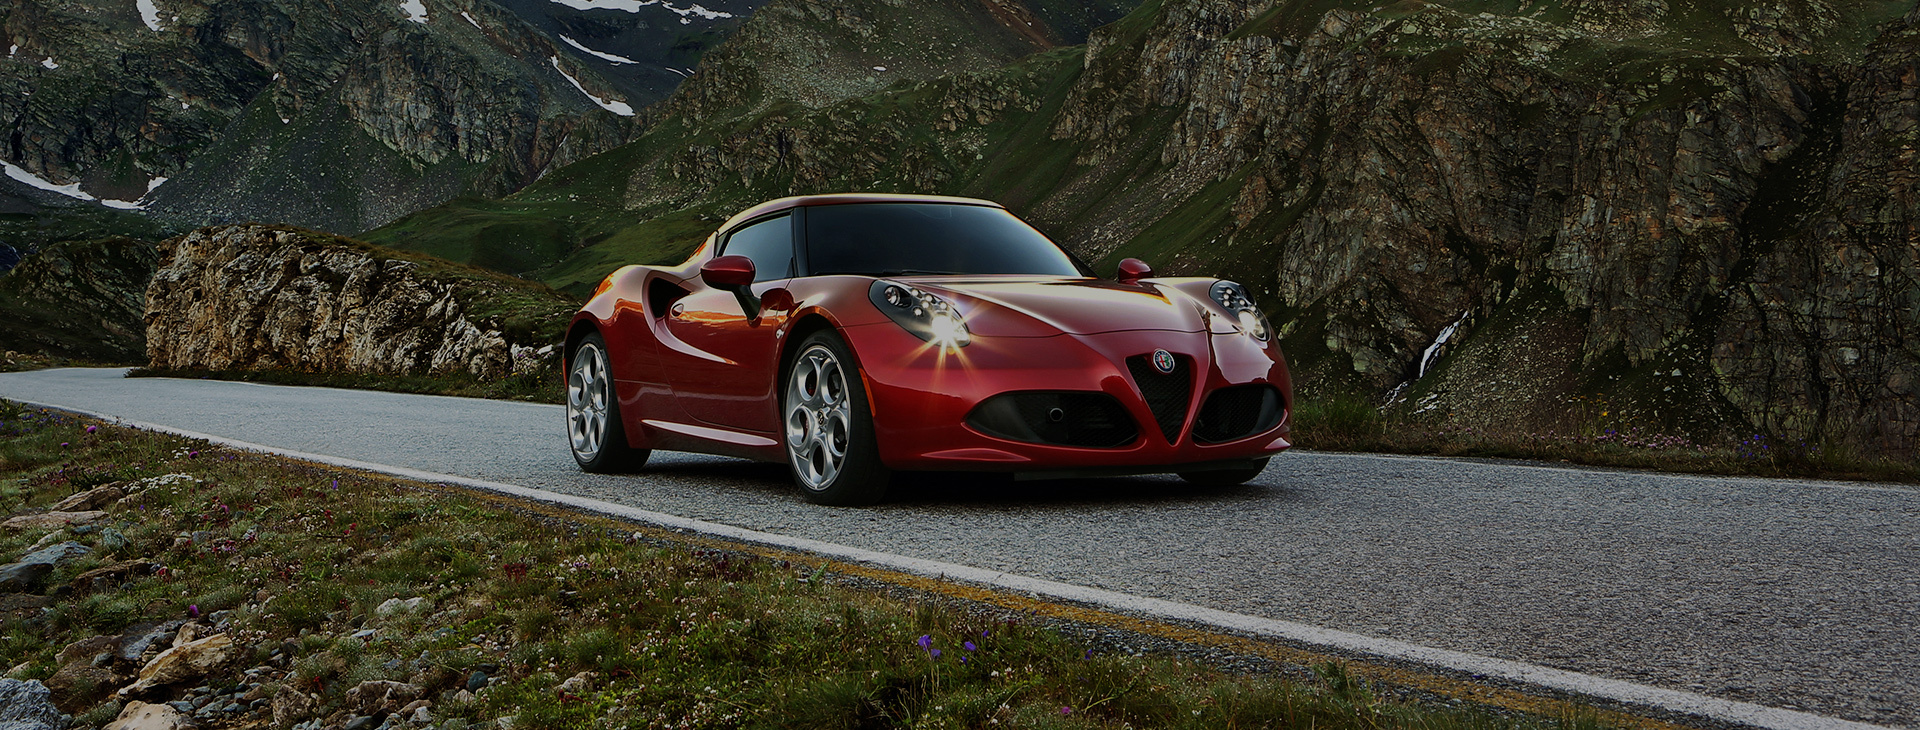 Fiat Chrysler Automobile - Social, Brand Content, Events